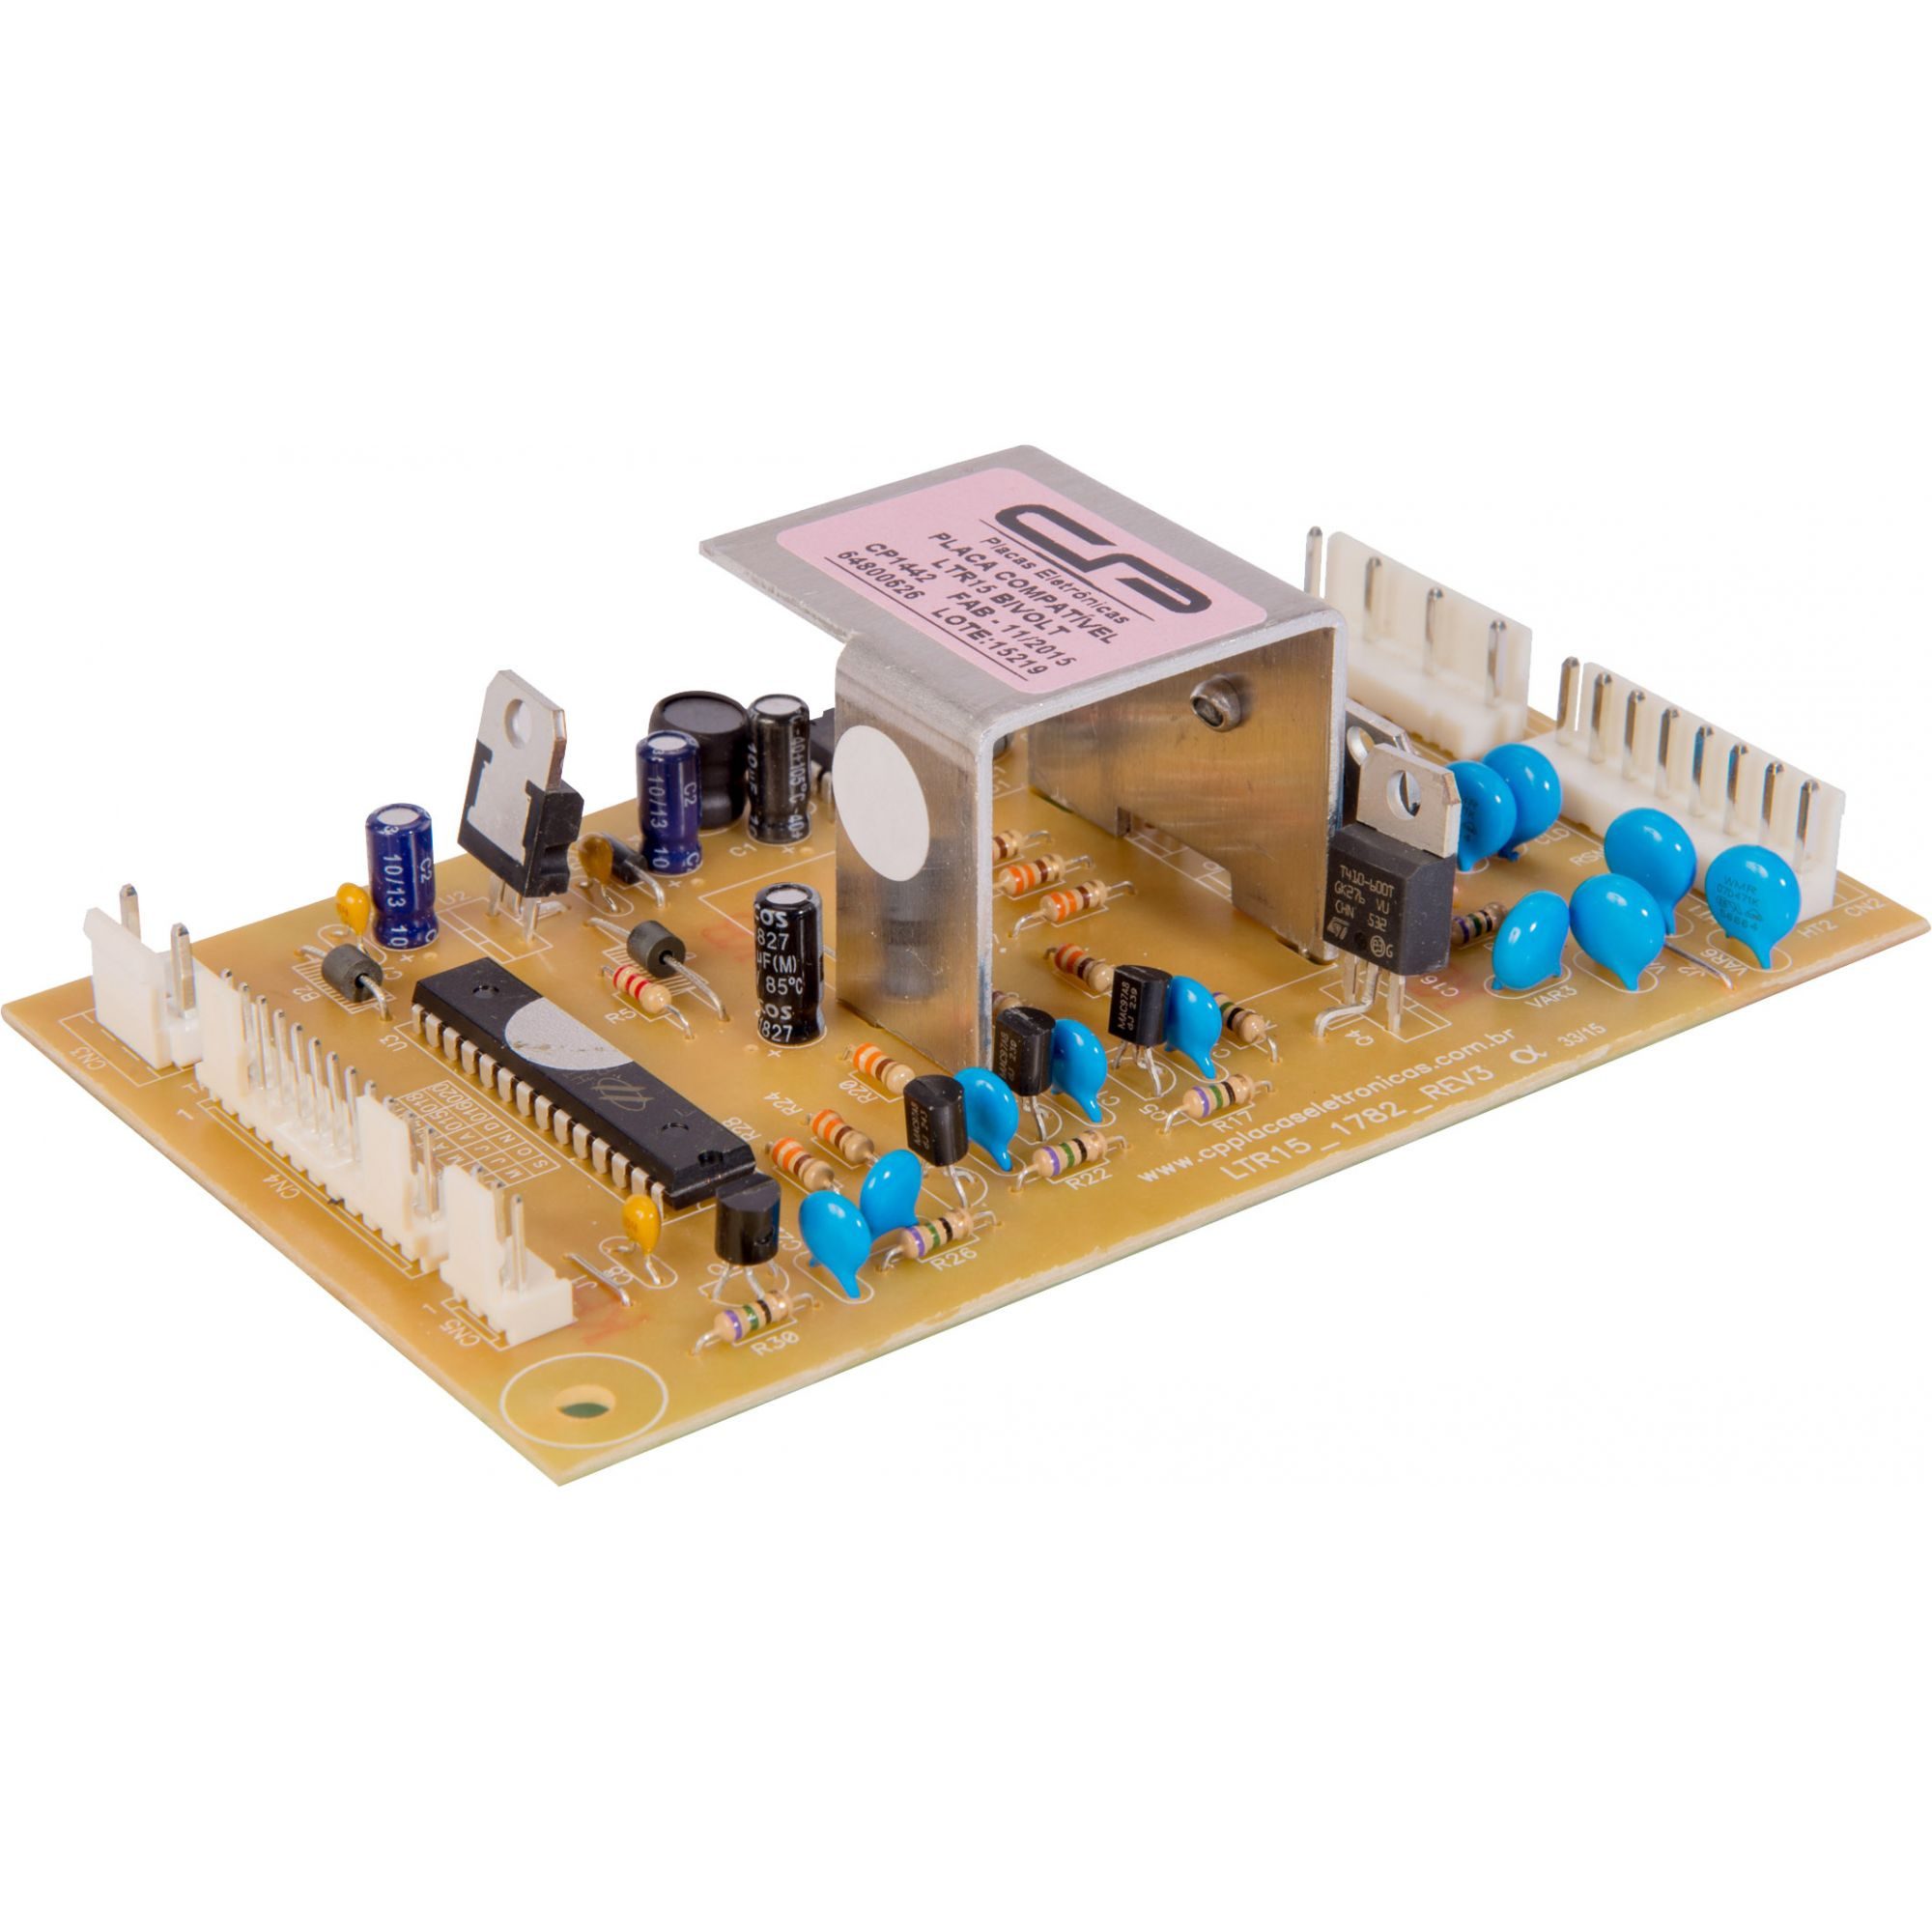 Placa Eletrônica Lavadora Electrolux Ltr15 Bivolt Cp